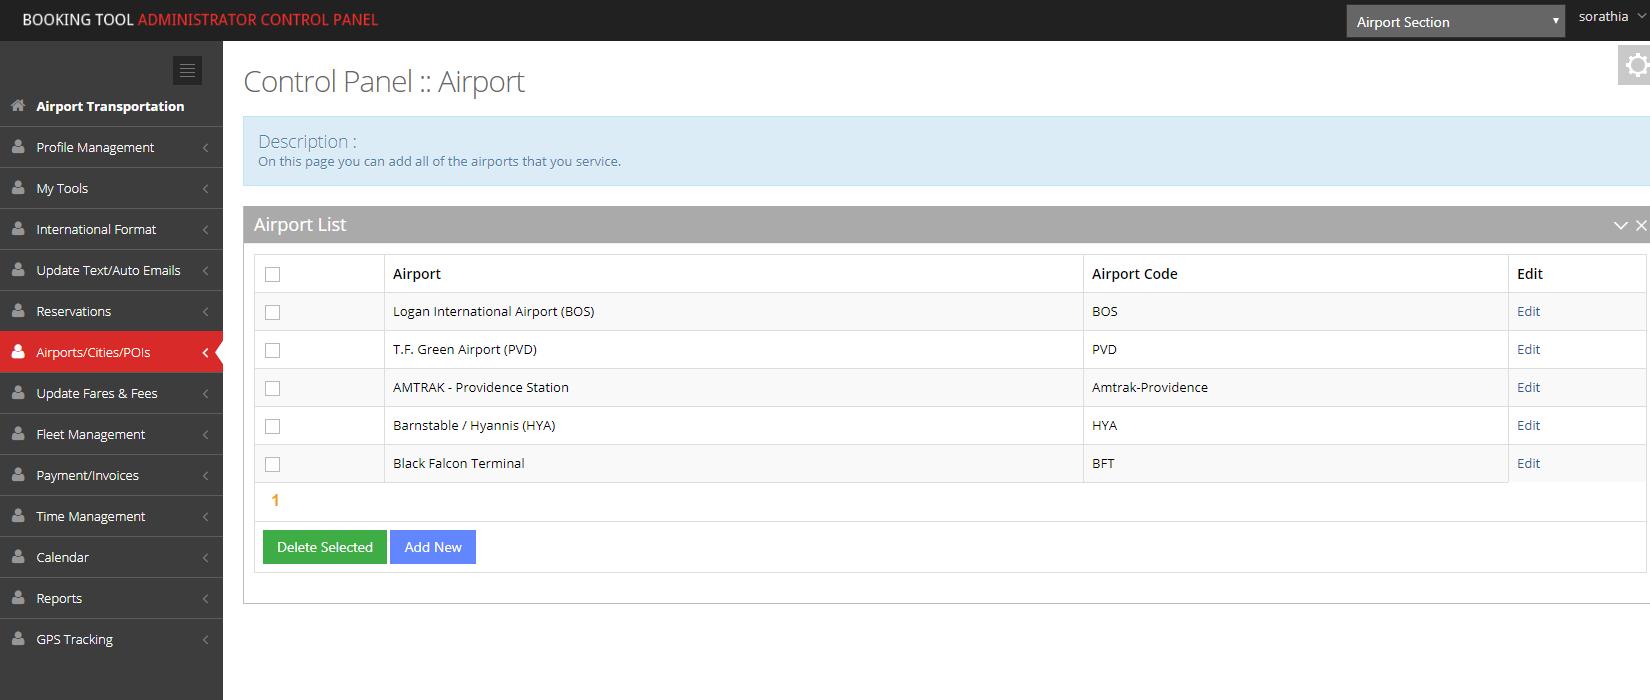 The Booking Tool control panel screenshot